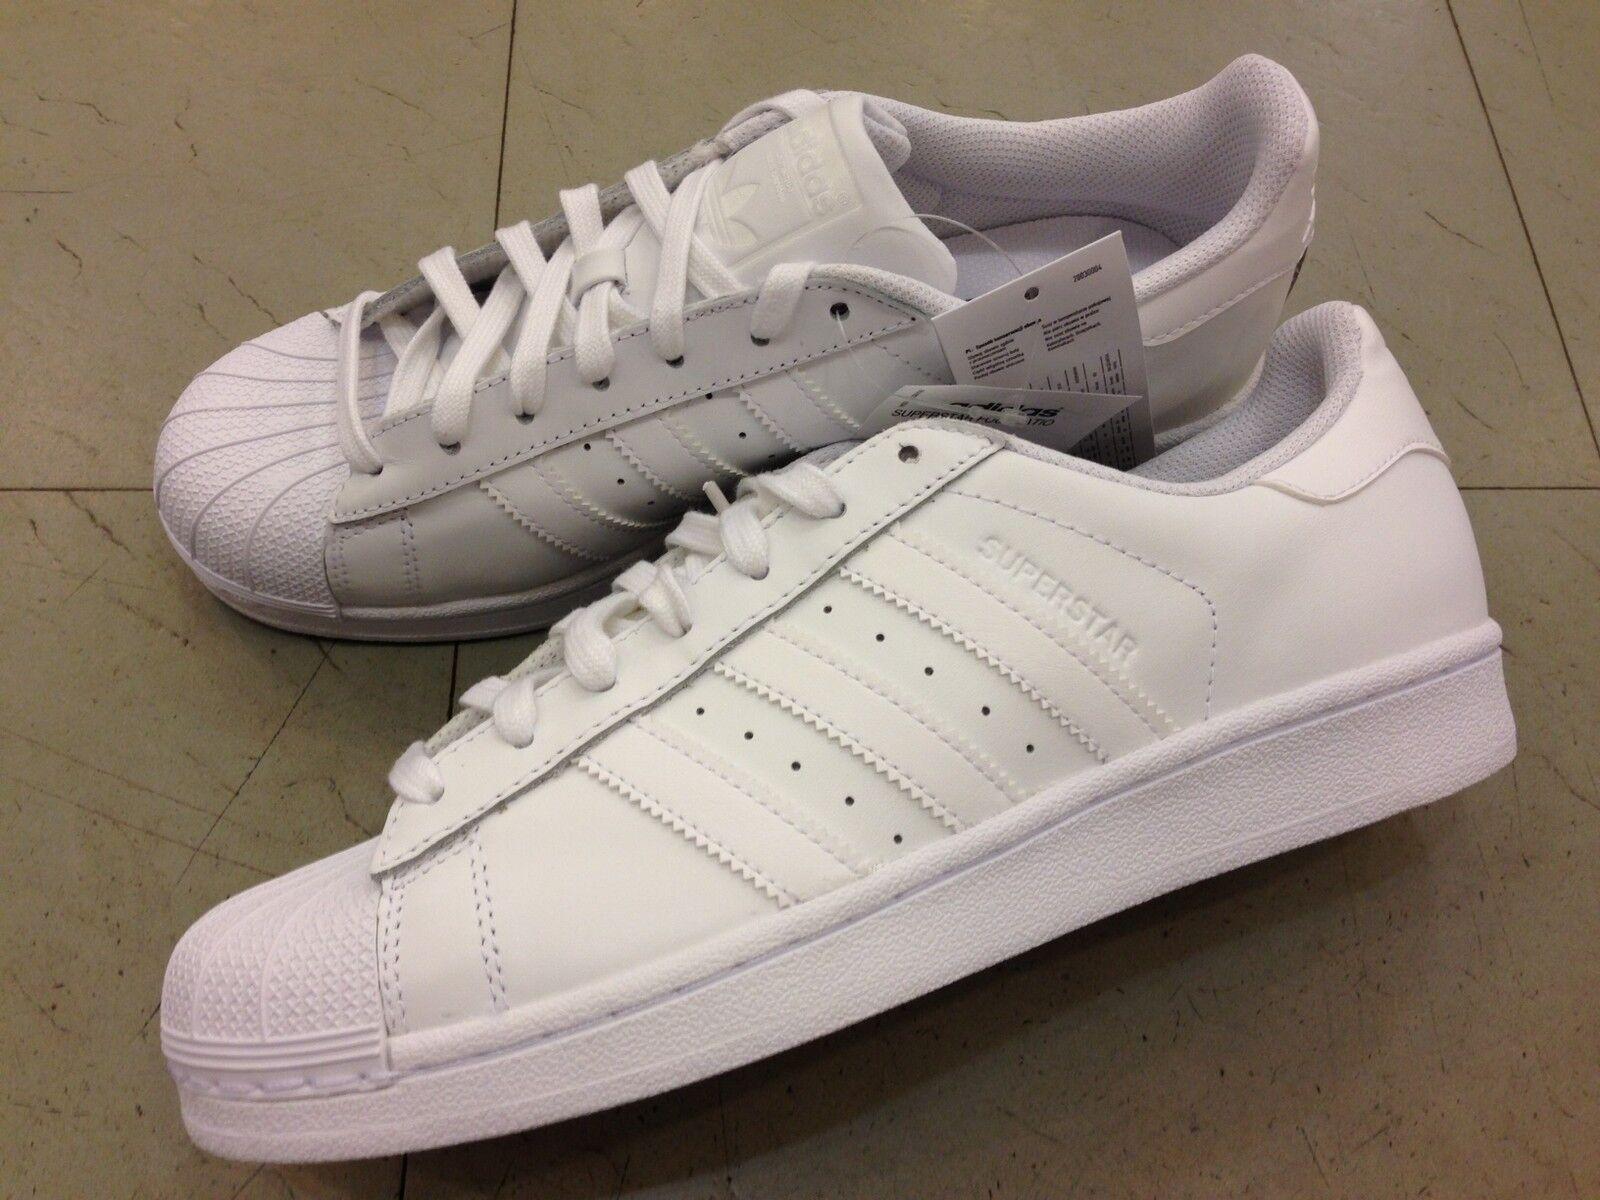 SHOES shoes men ADIDAS ORIGINALS SUPERSTAR FOUNDATION B27136 LEATHER WHITE